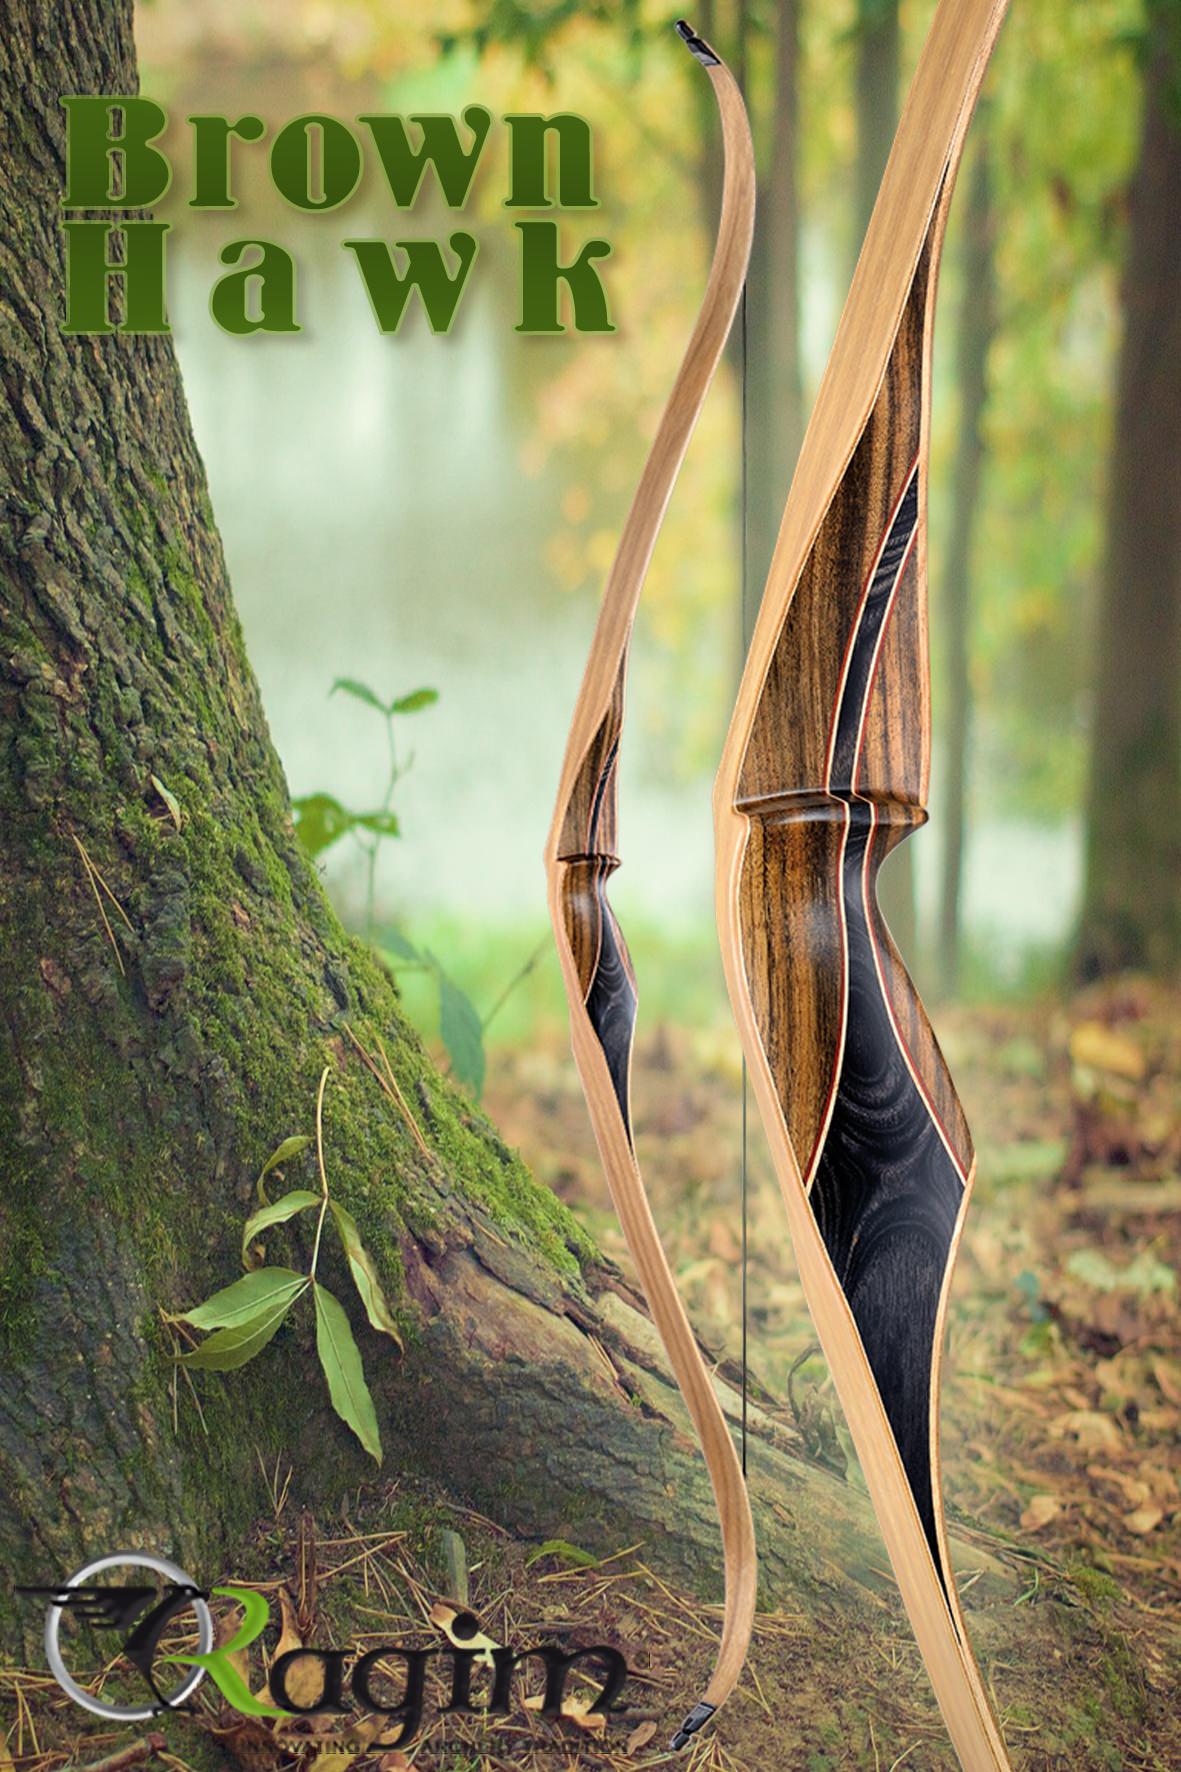 Brown Hawk 2016